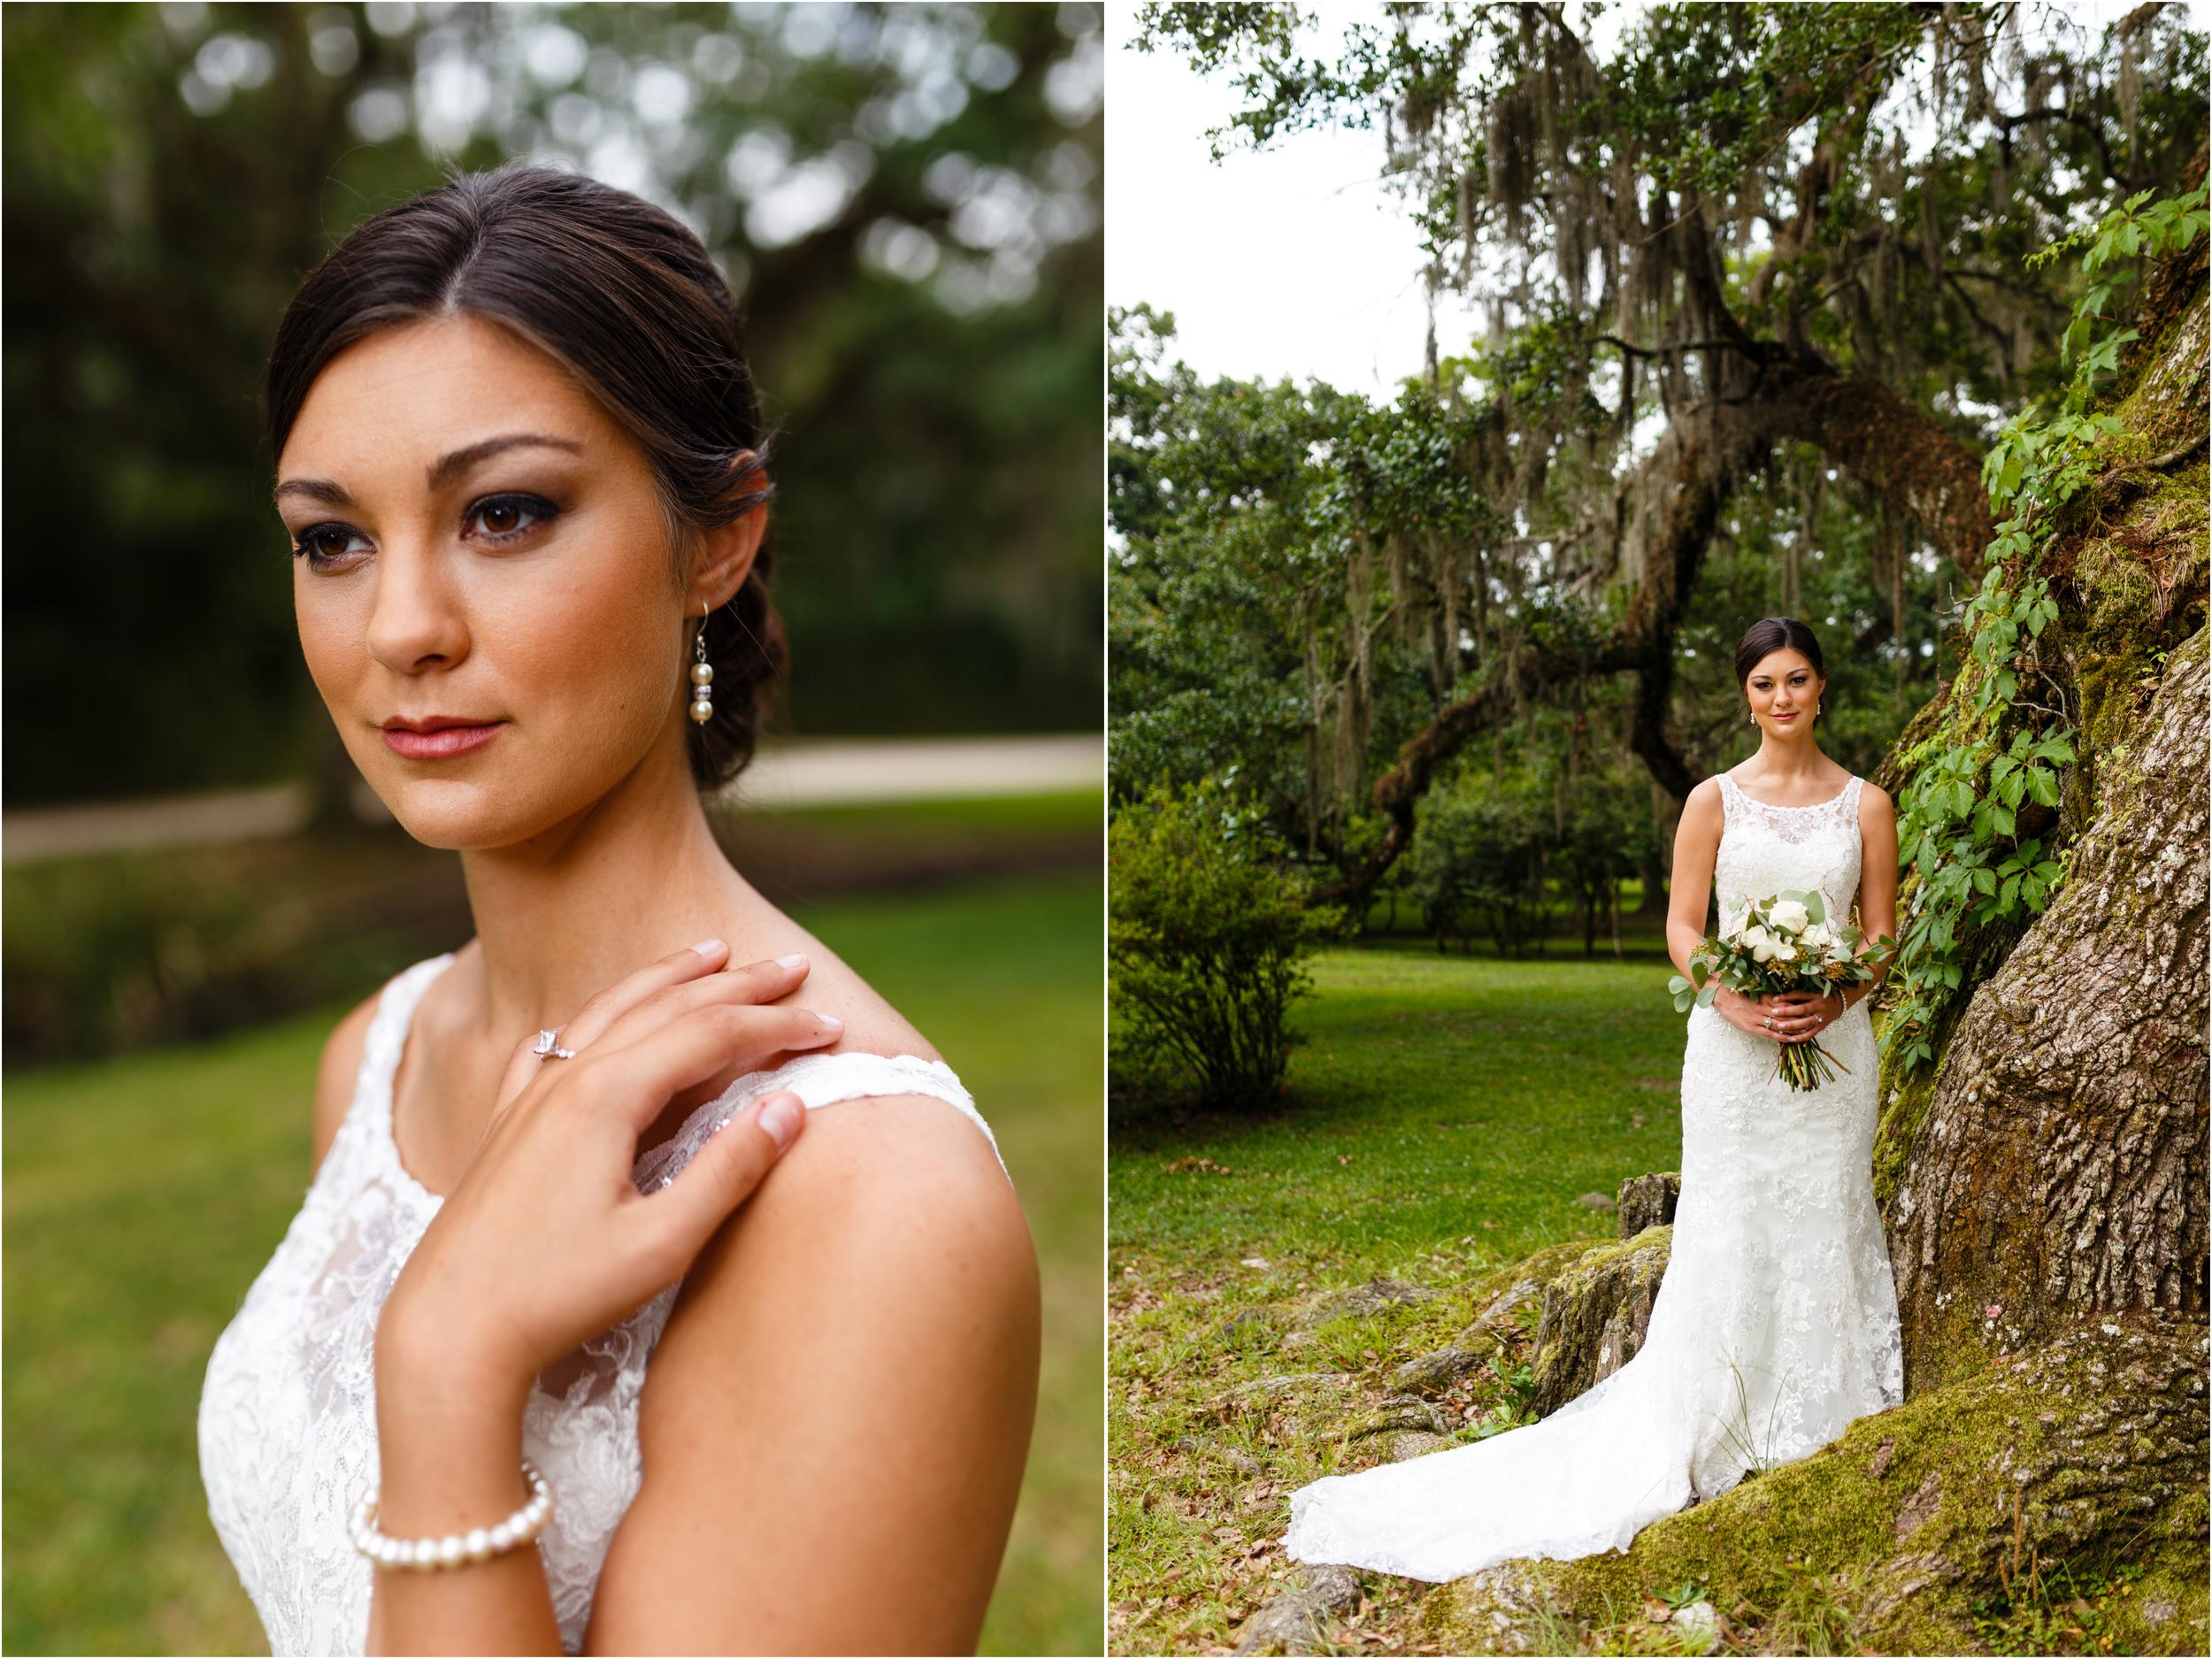 Bridal-wedding-portrait-lafayette-broussard-youngsville-photographer-6 (1).jpg